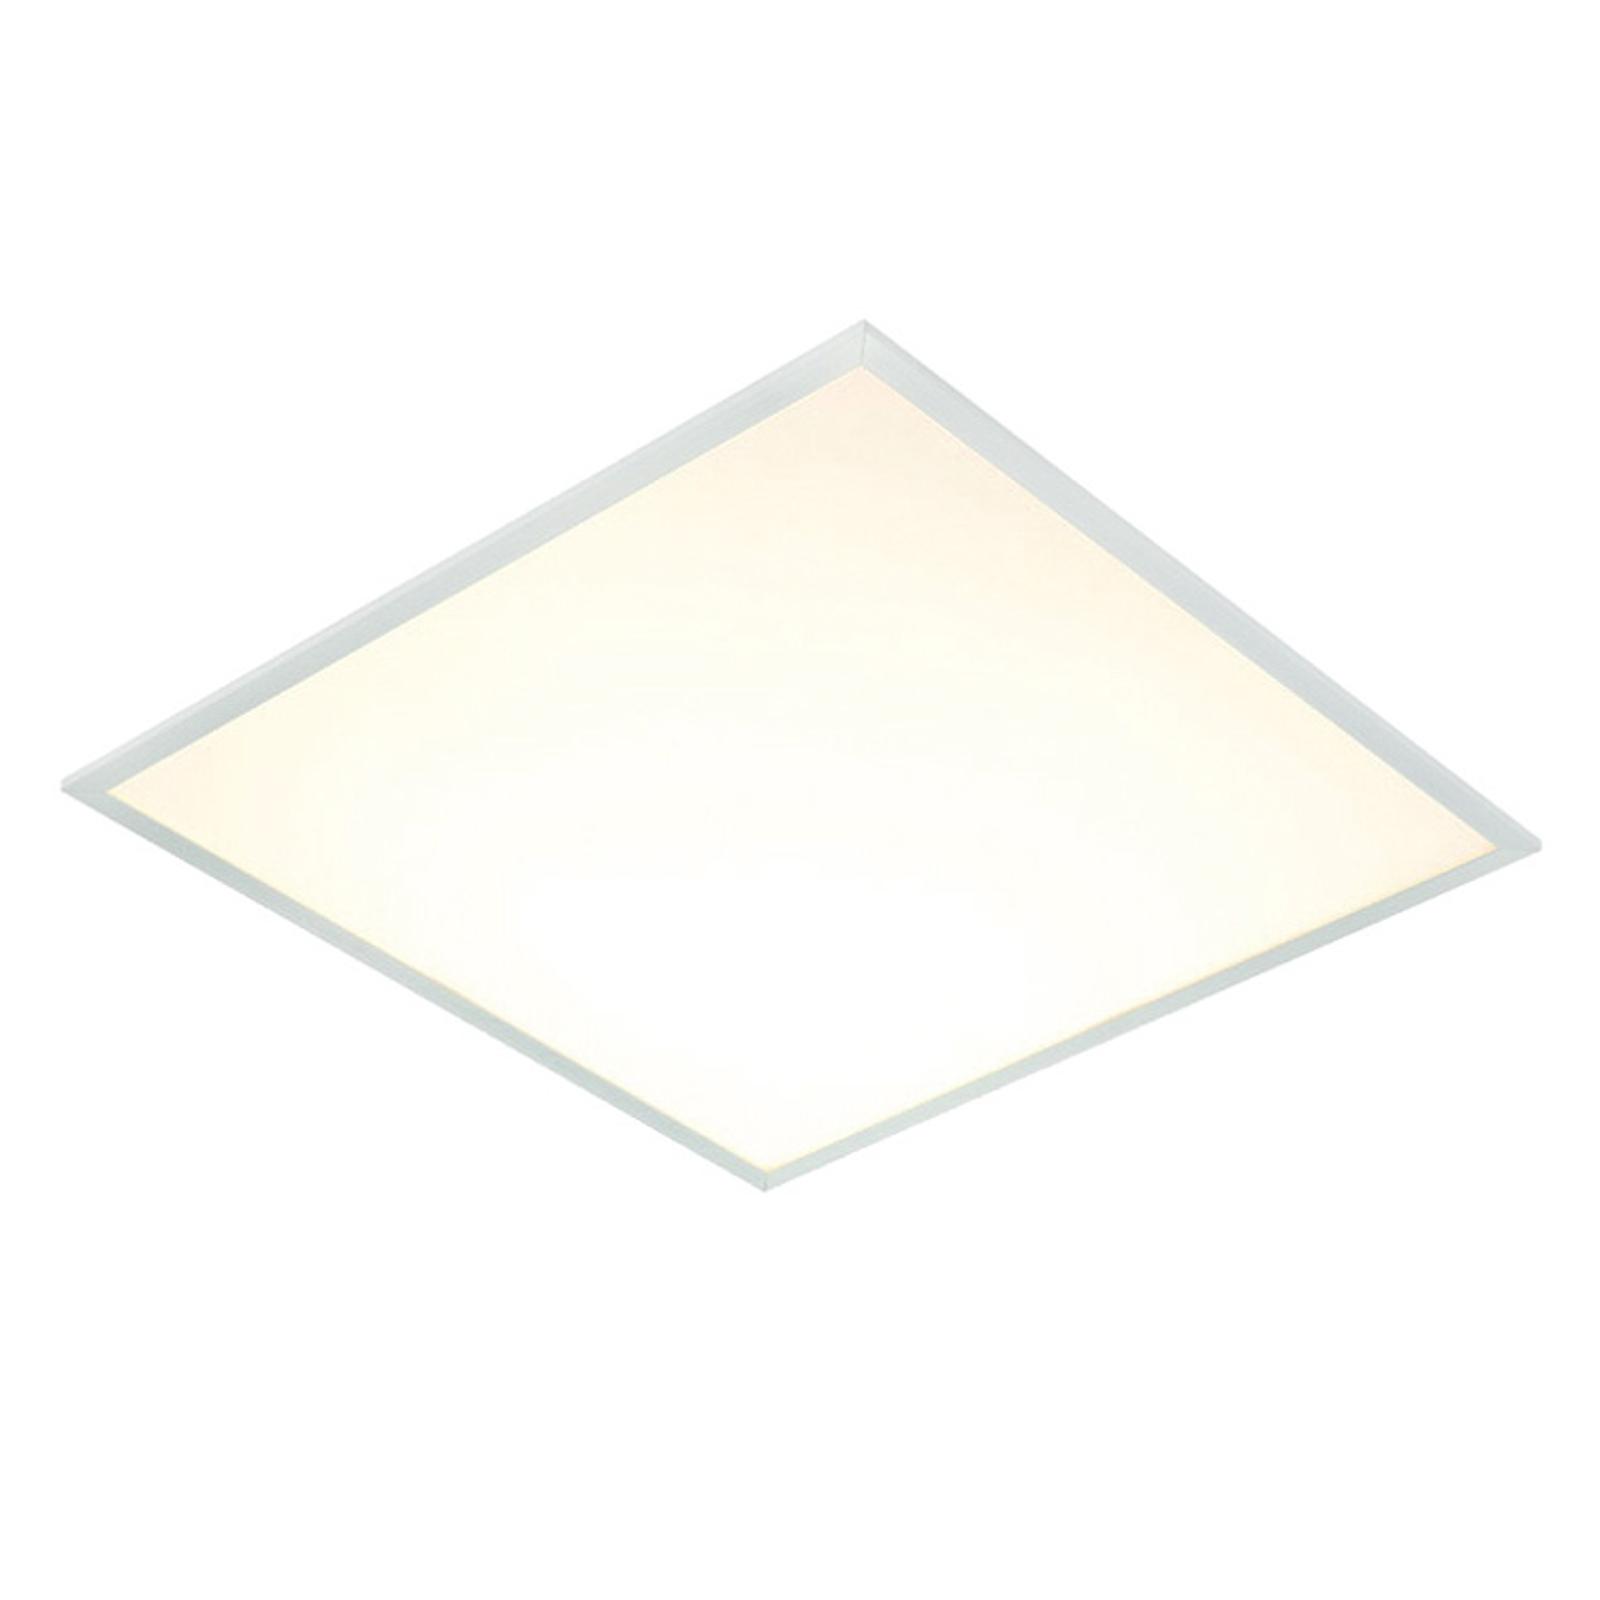 LED-panel PAN40U2-952 40W Ra90 4000K IP20